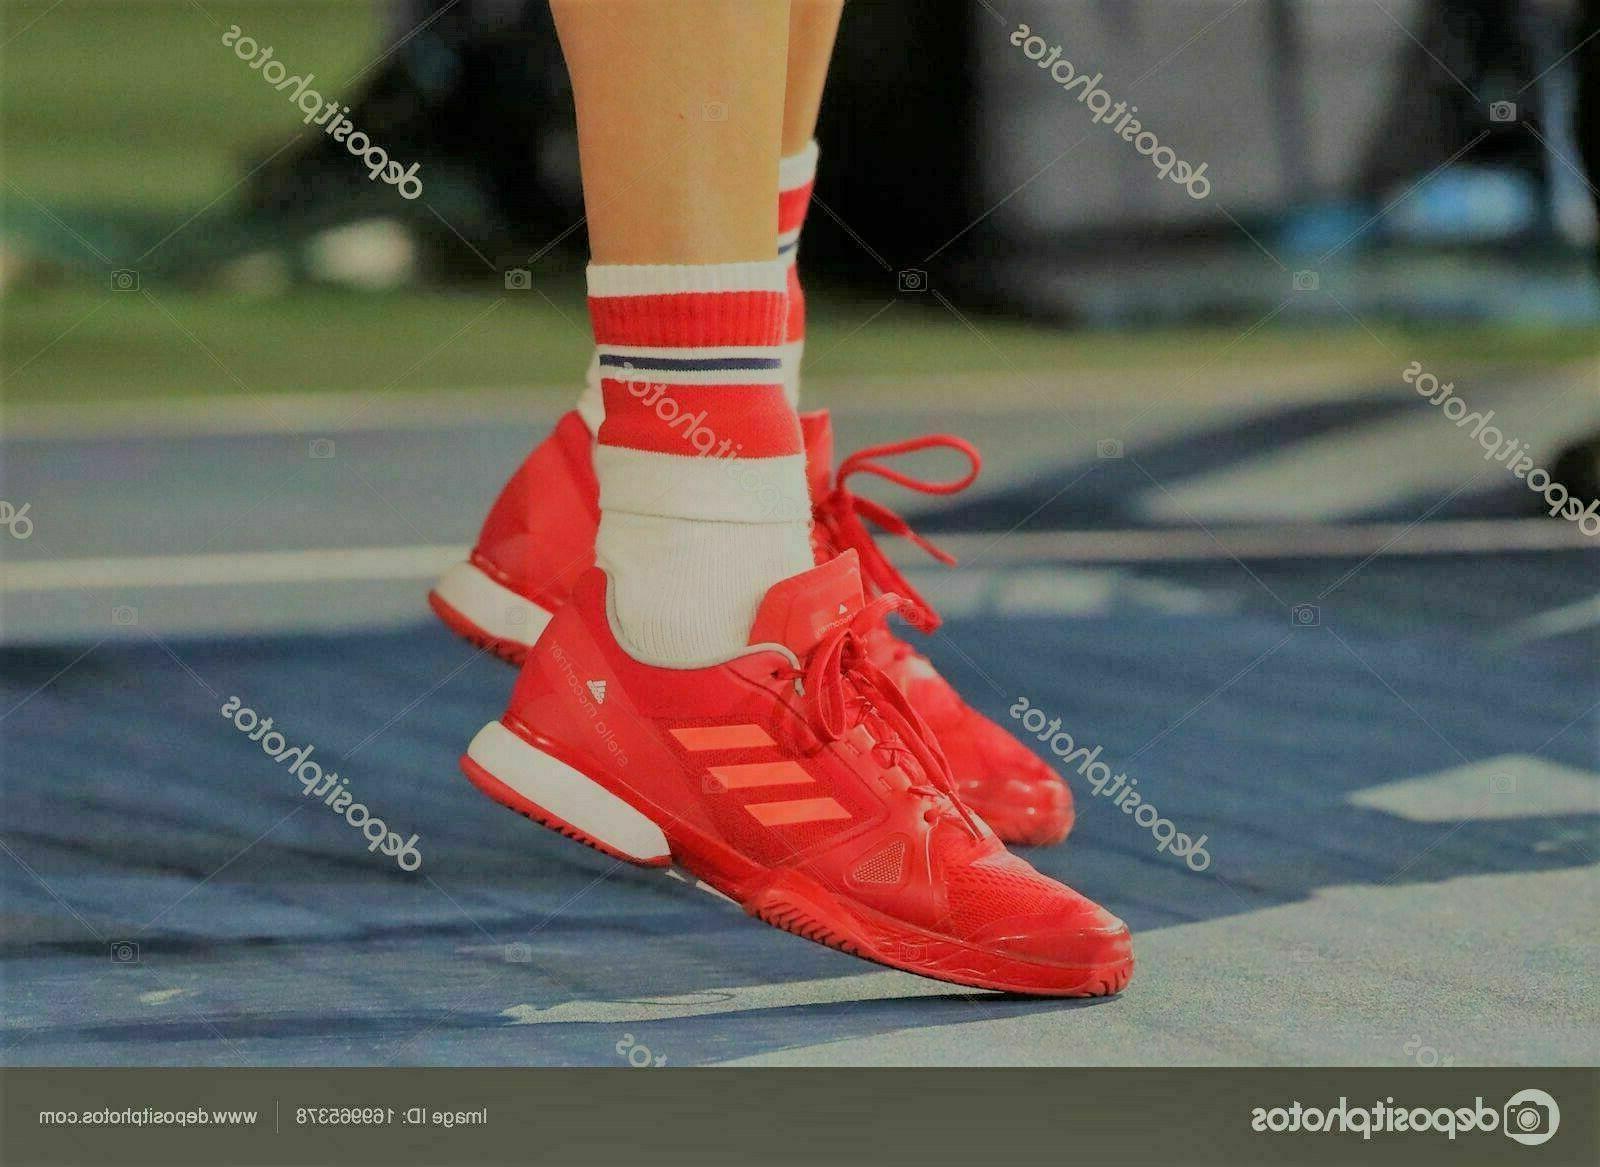 NEW Adidas McCartney Women Boost Shoes